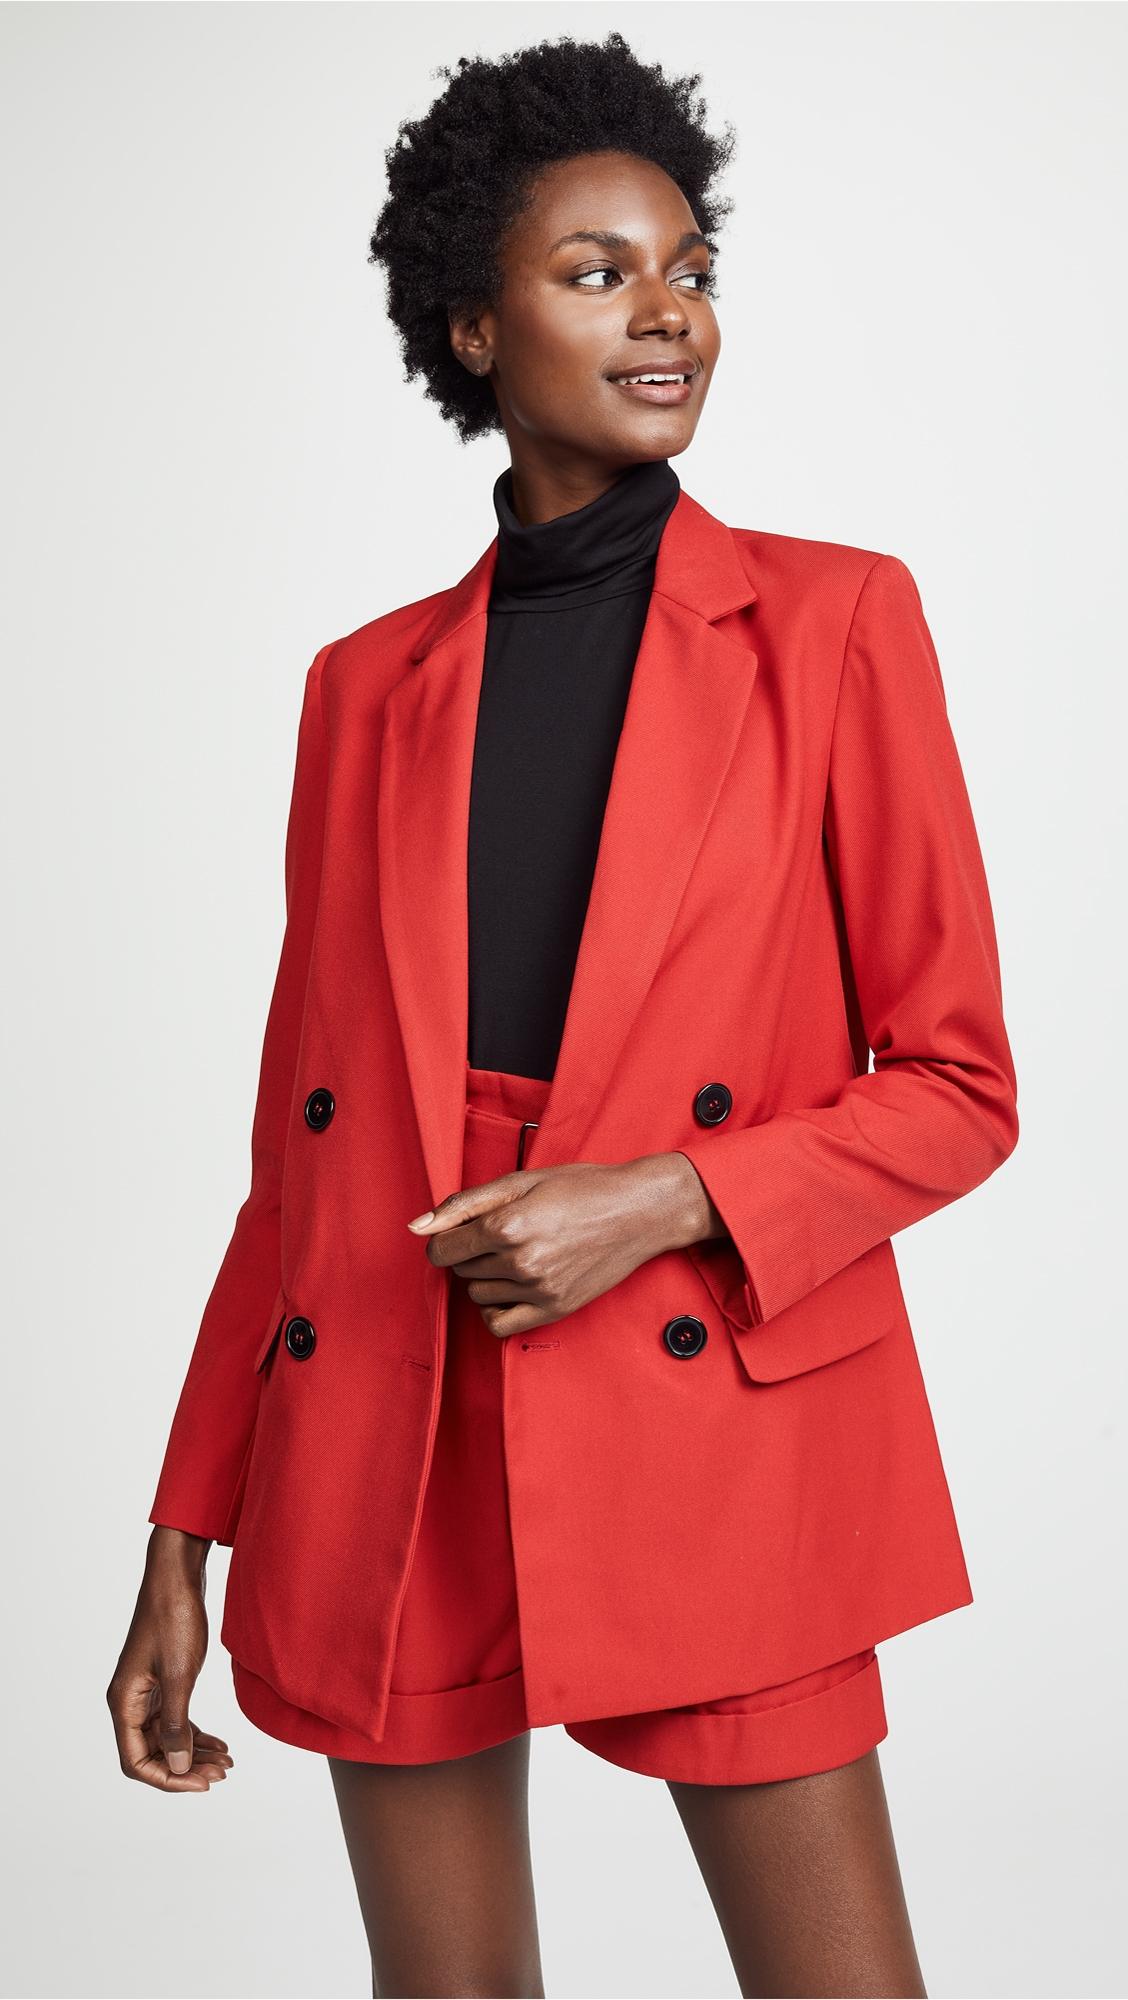 How to blazer a red wear pinterest